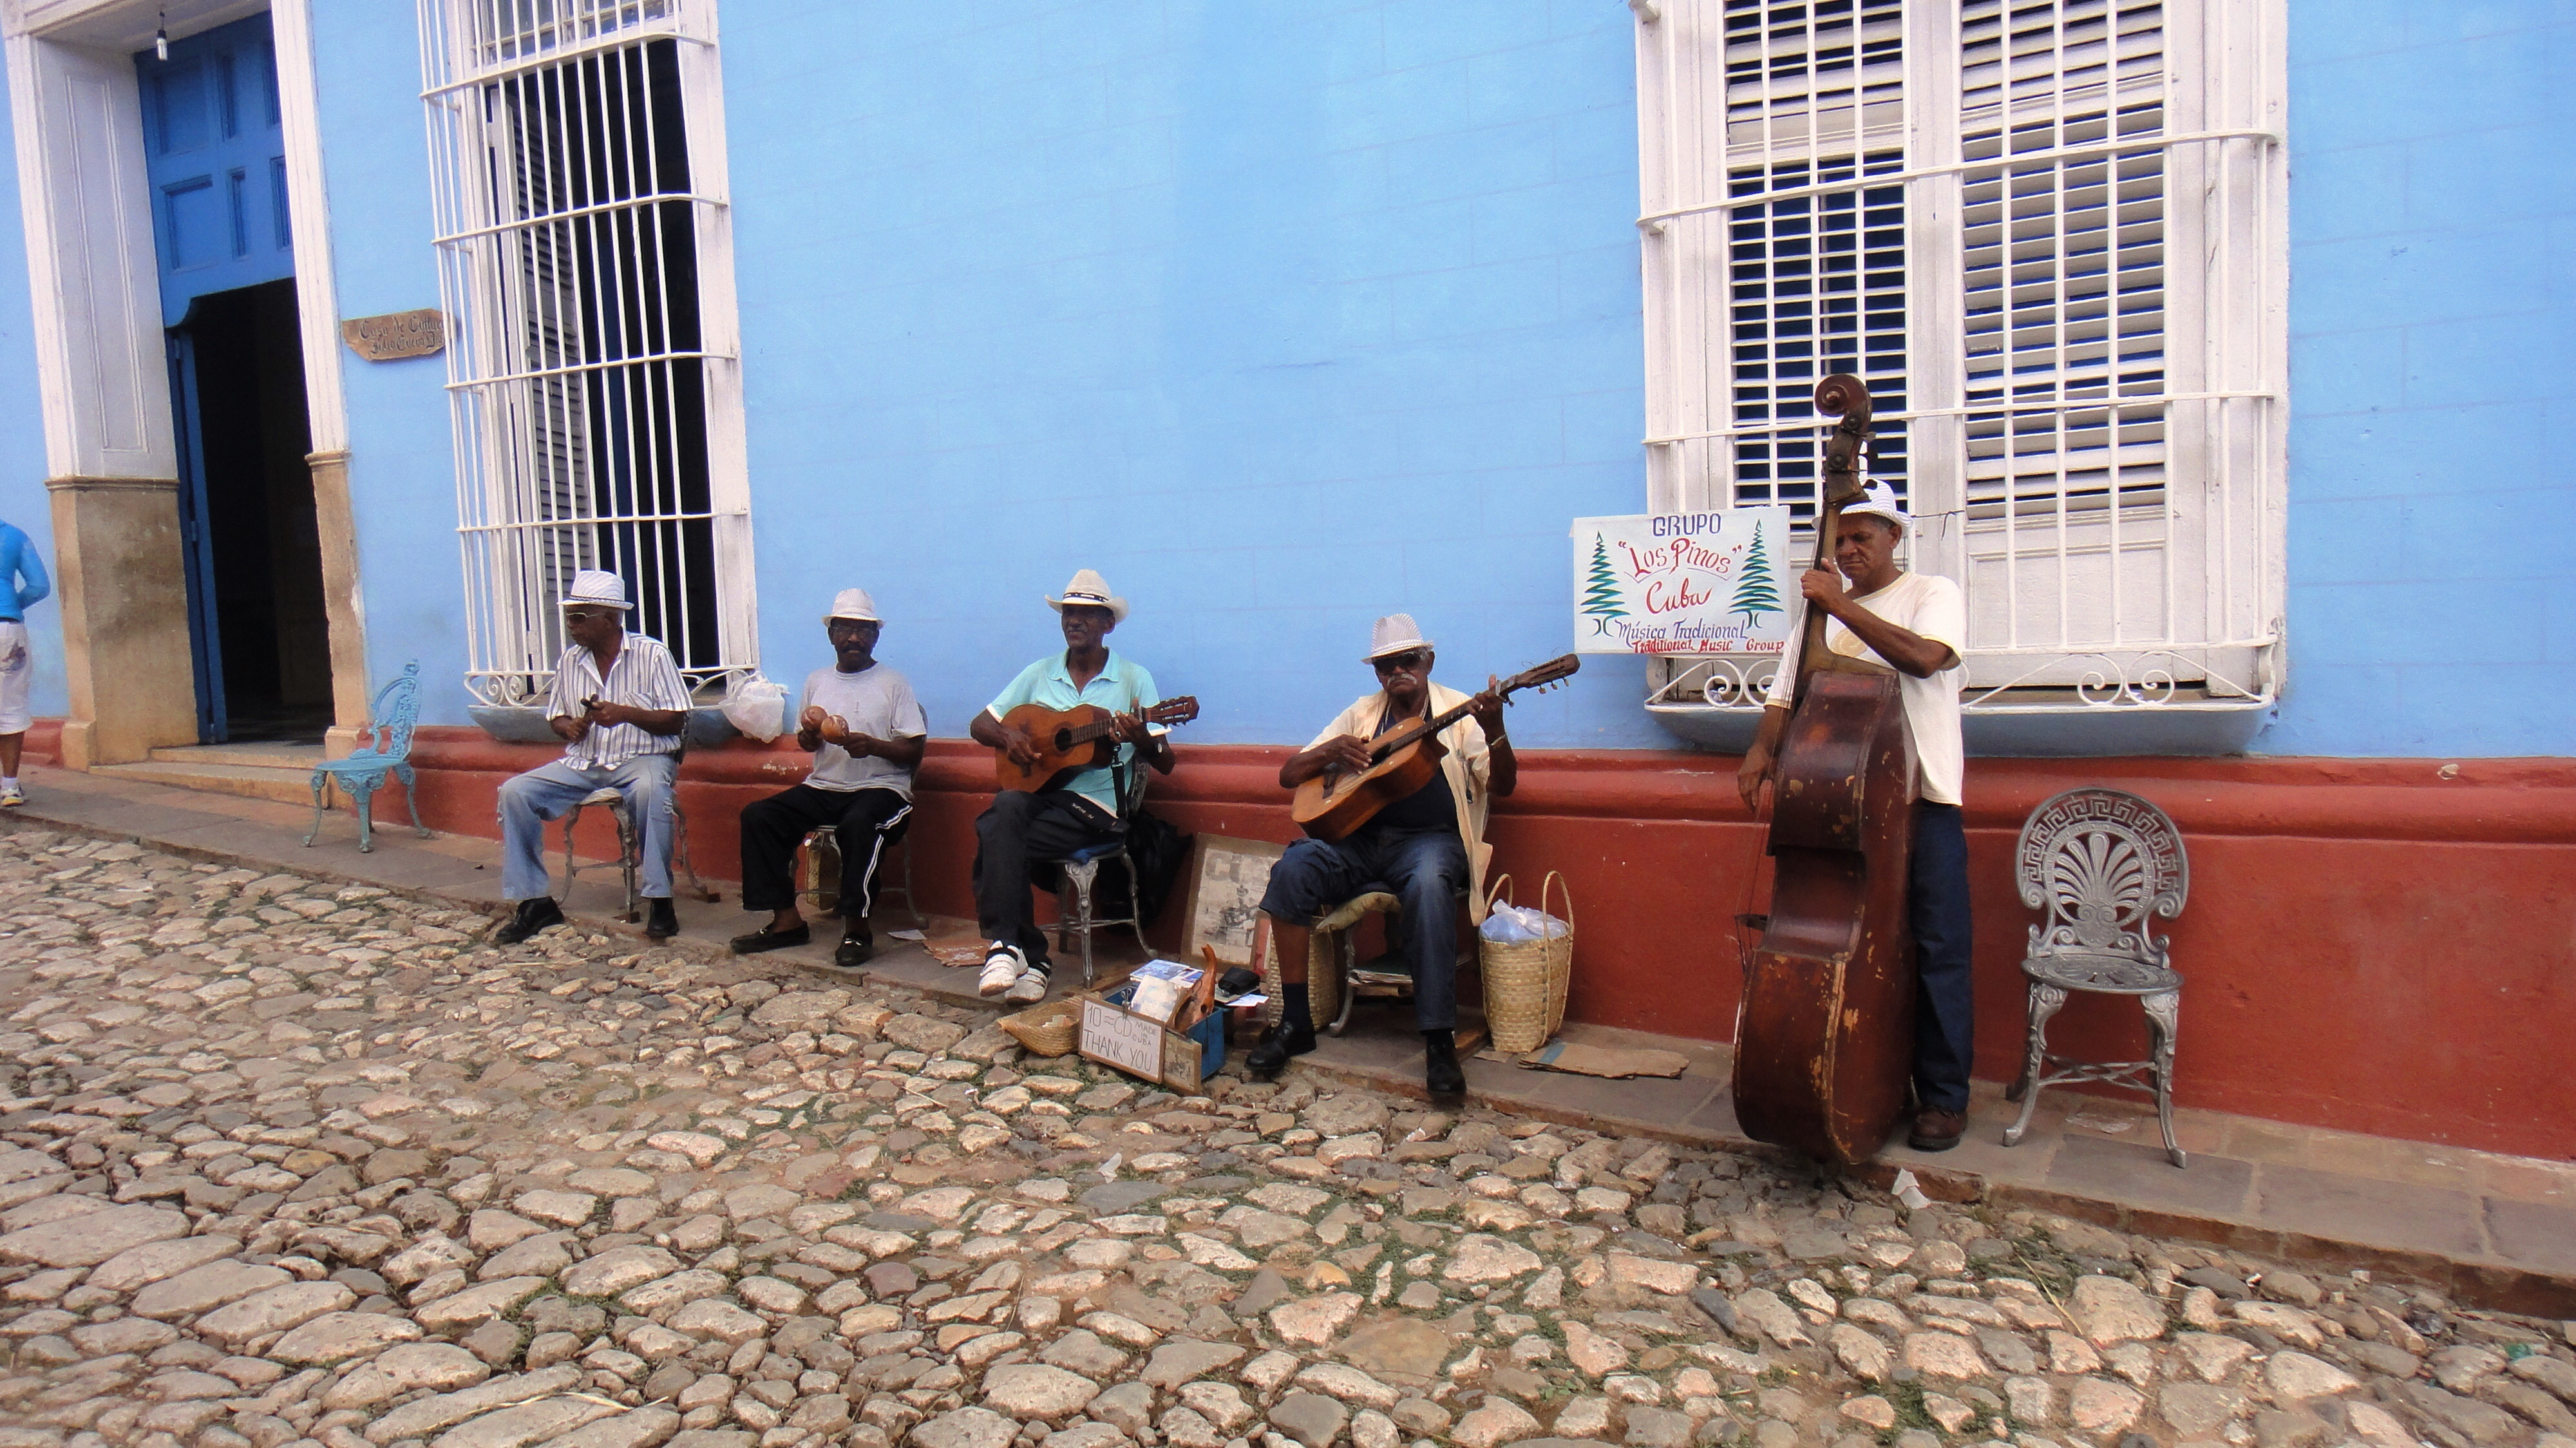 Cuba dating site